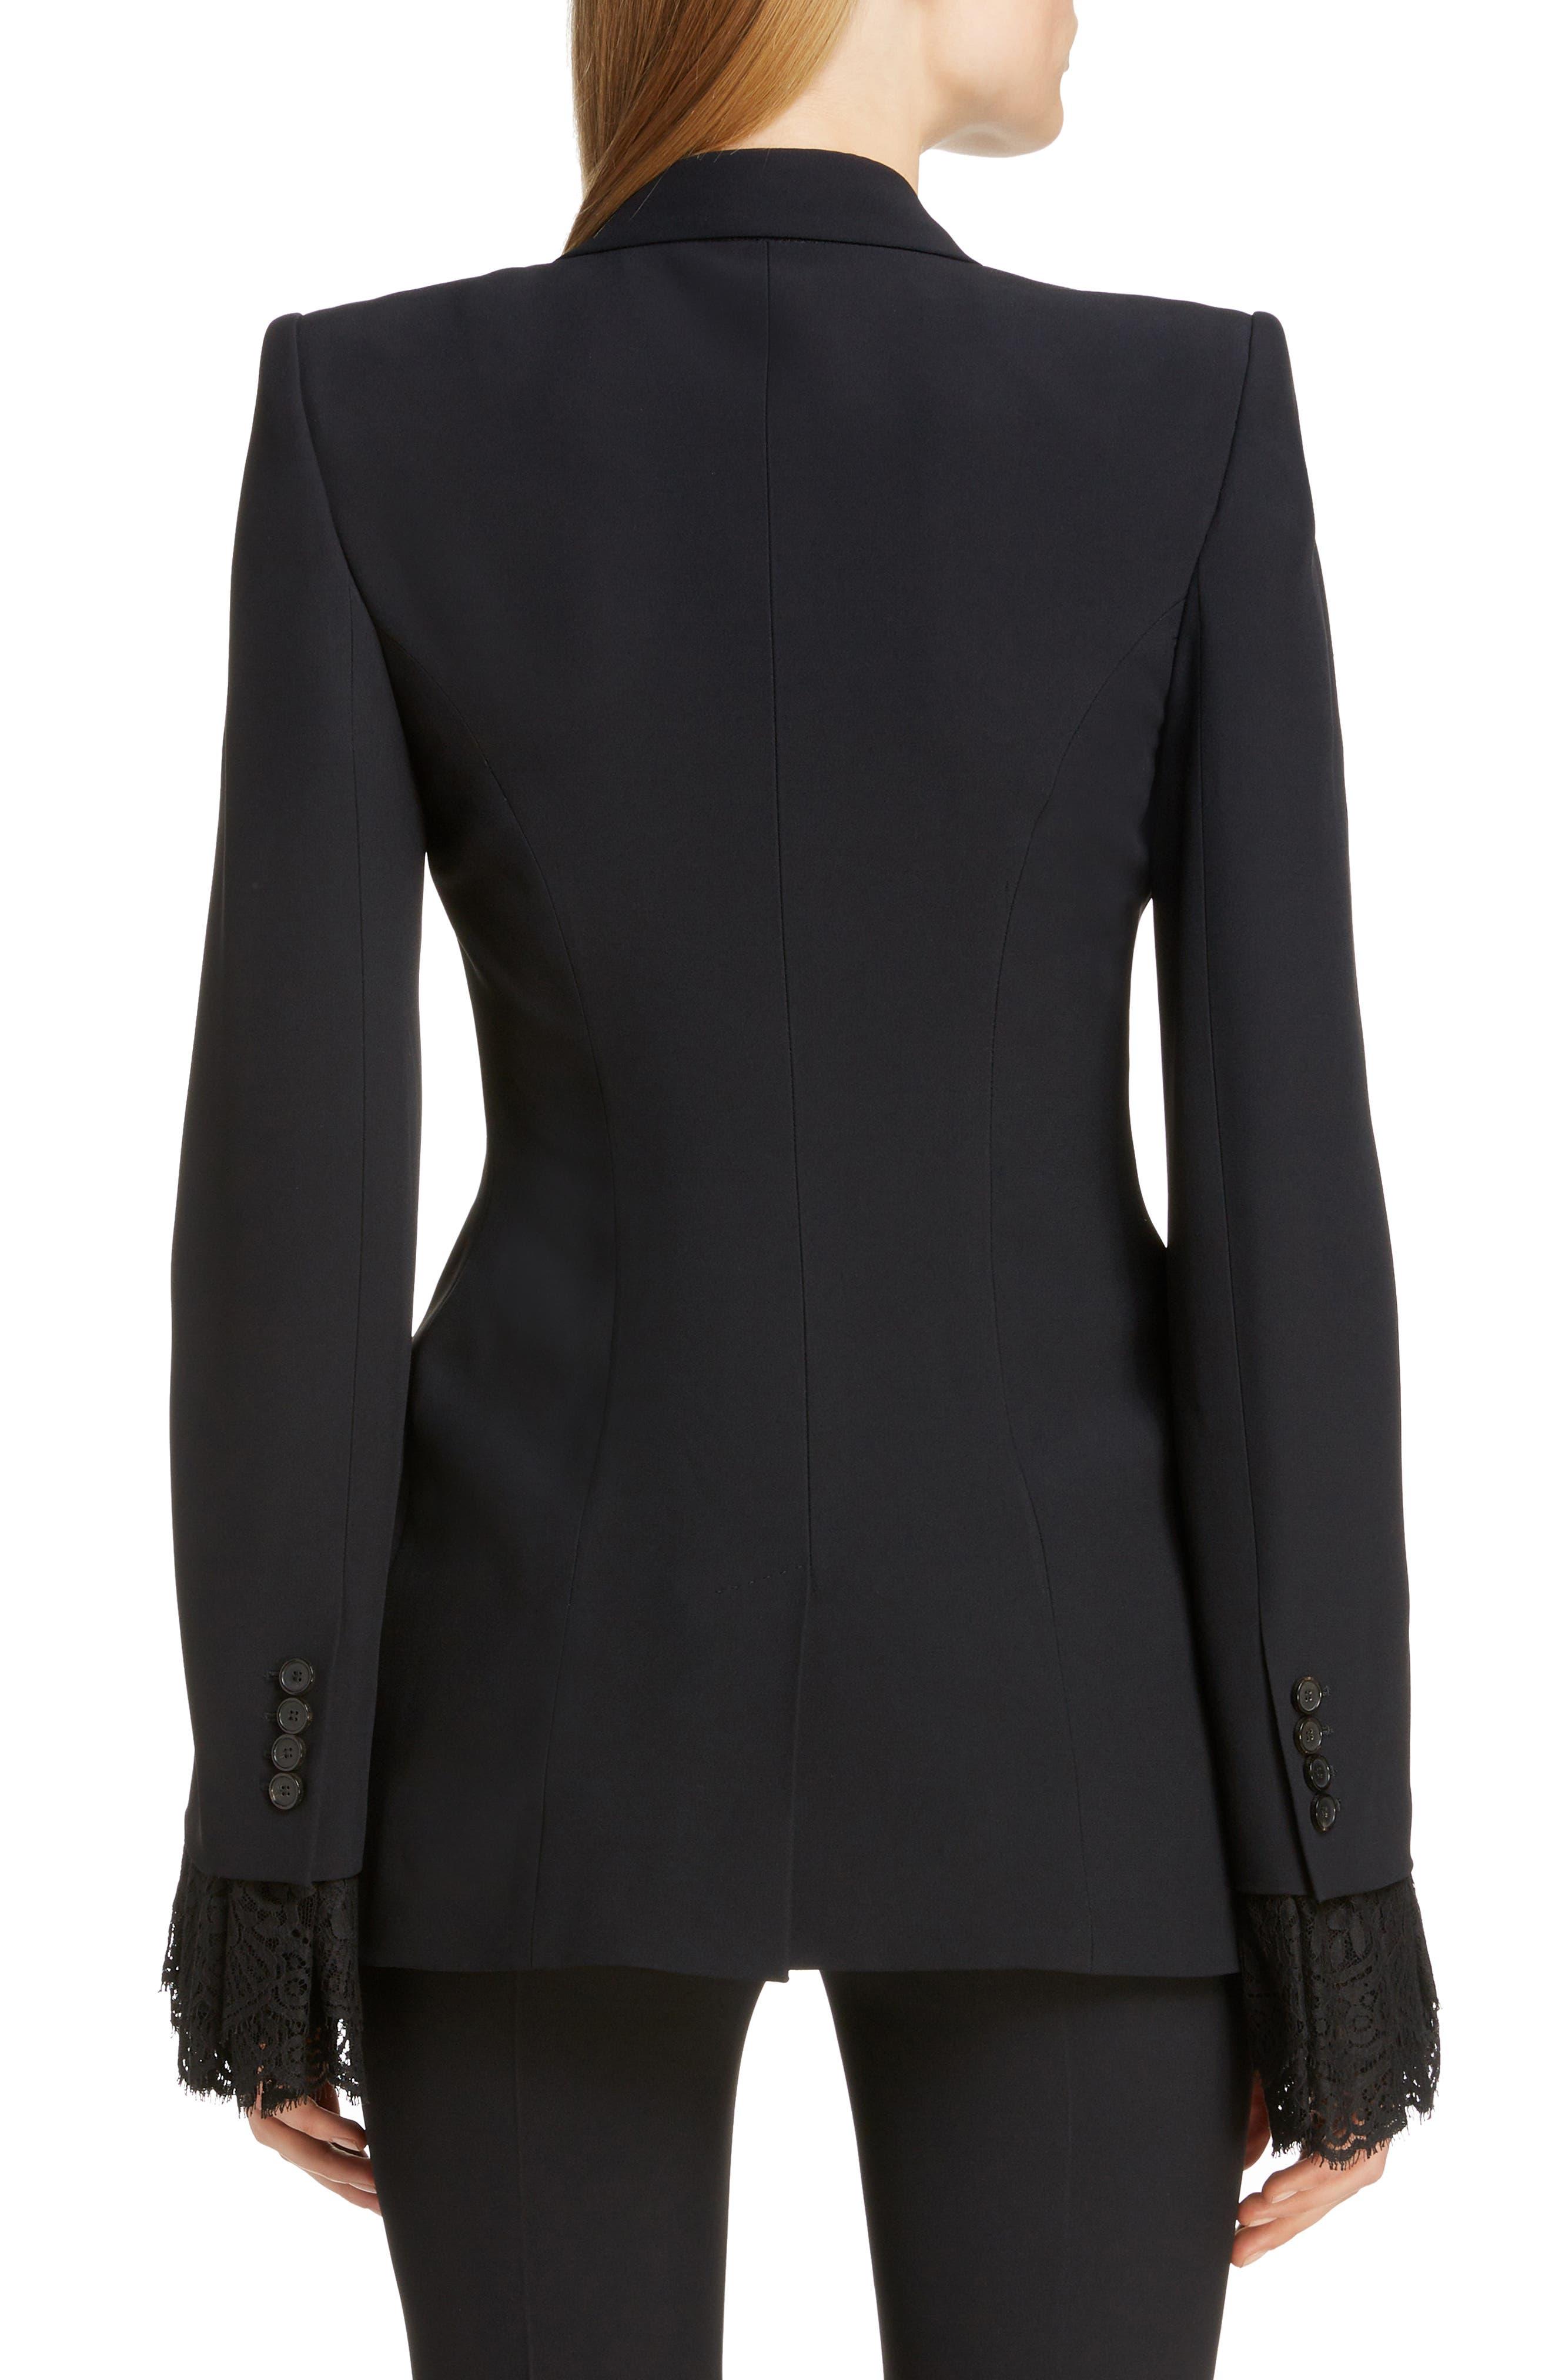 8eb2a7b7716 Alexander McQueen Women s Blazers   Jackets Clothing